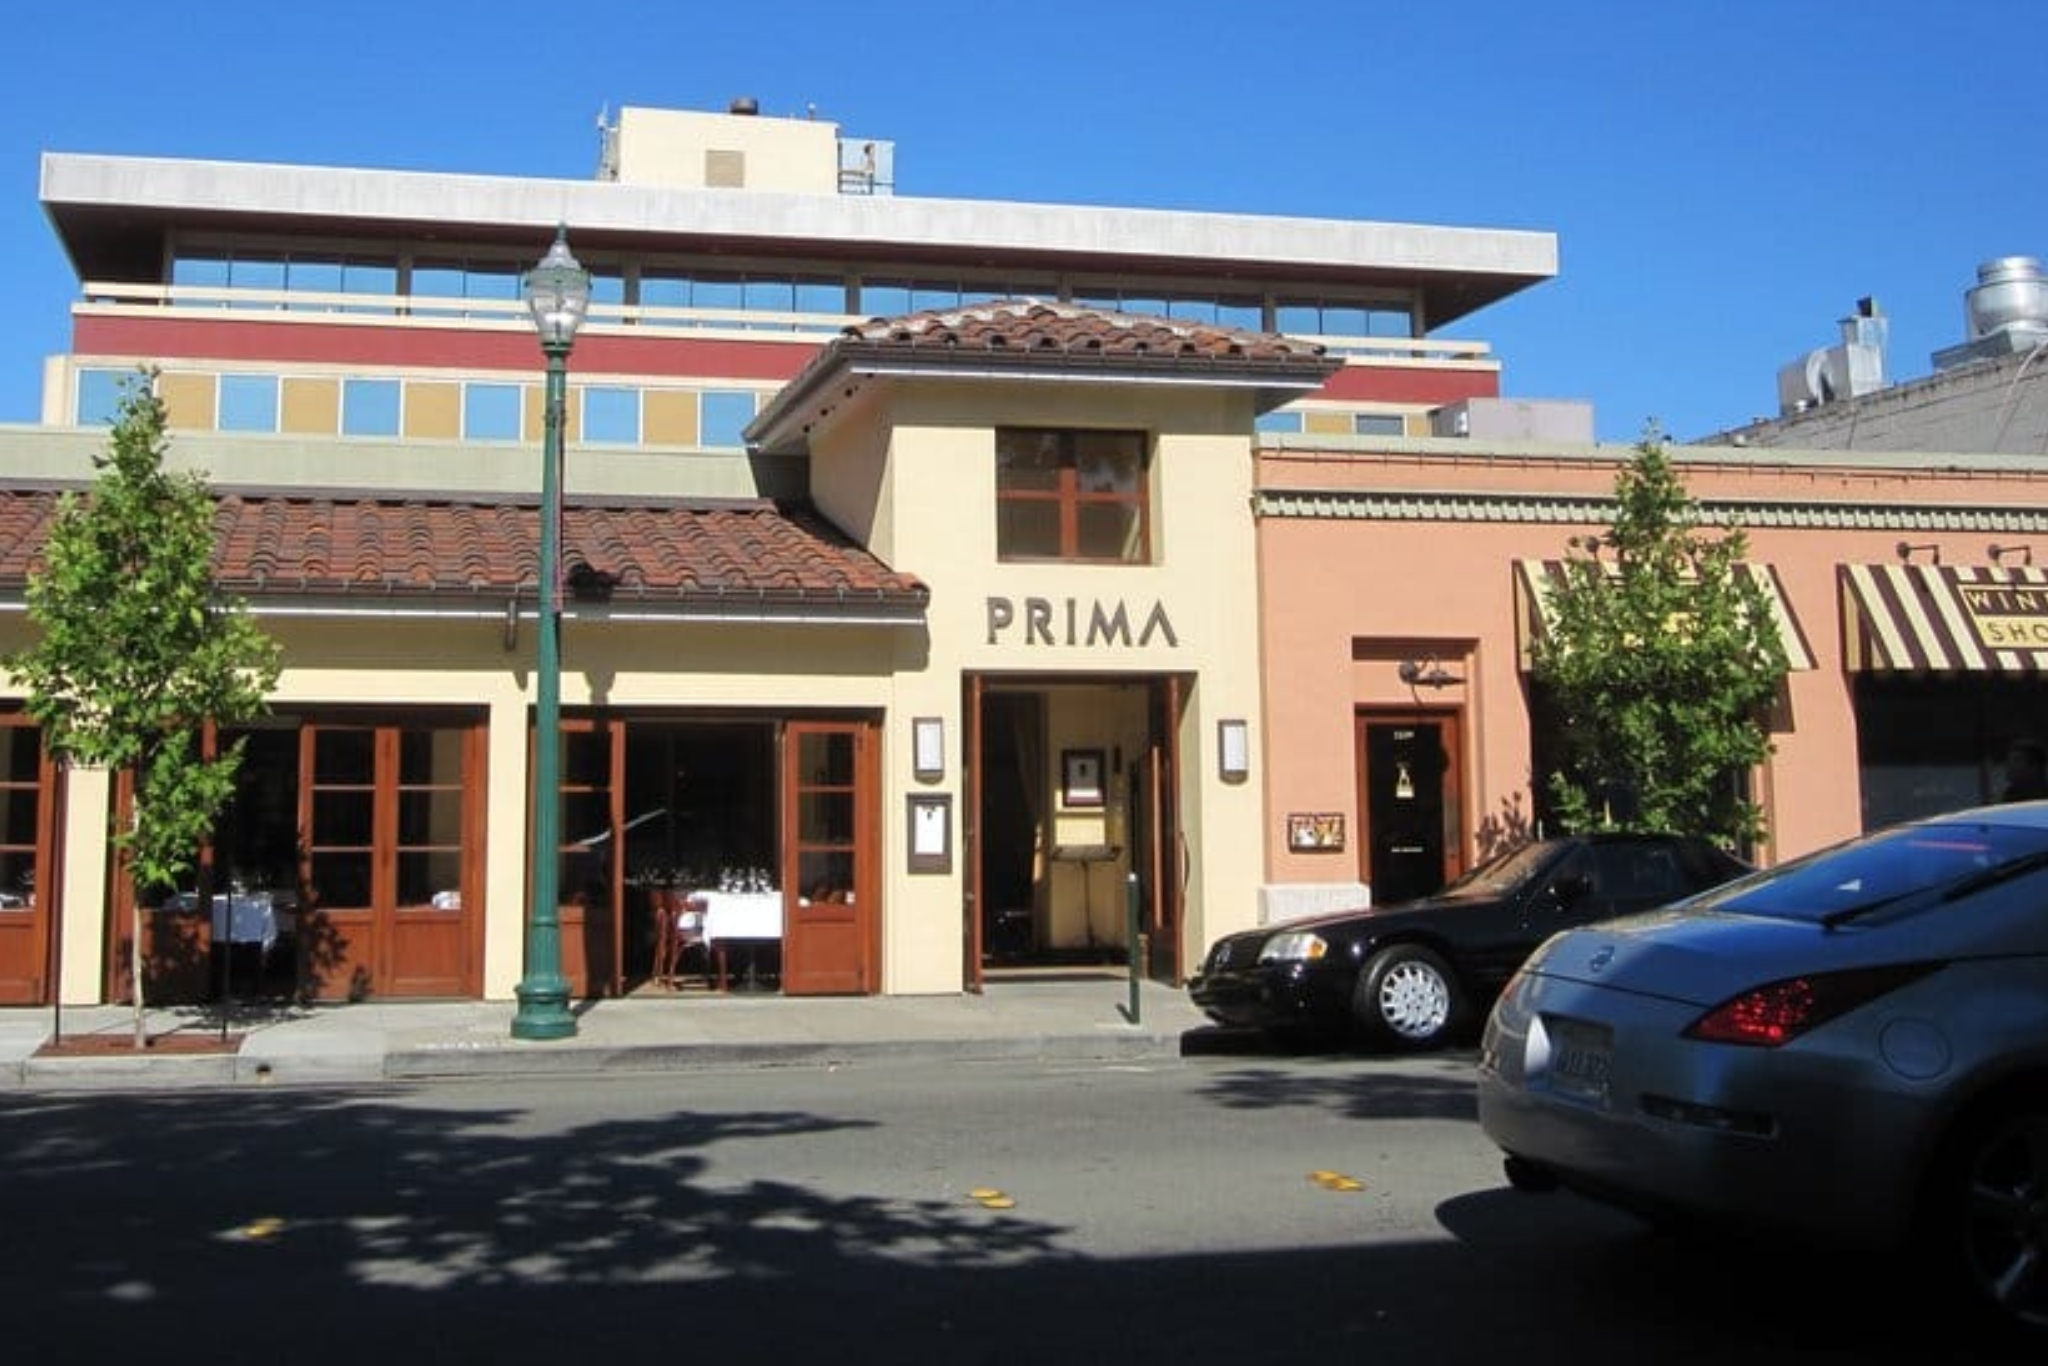 Walnut Creek Restaurant Prima Shutters After 43 Years photo